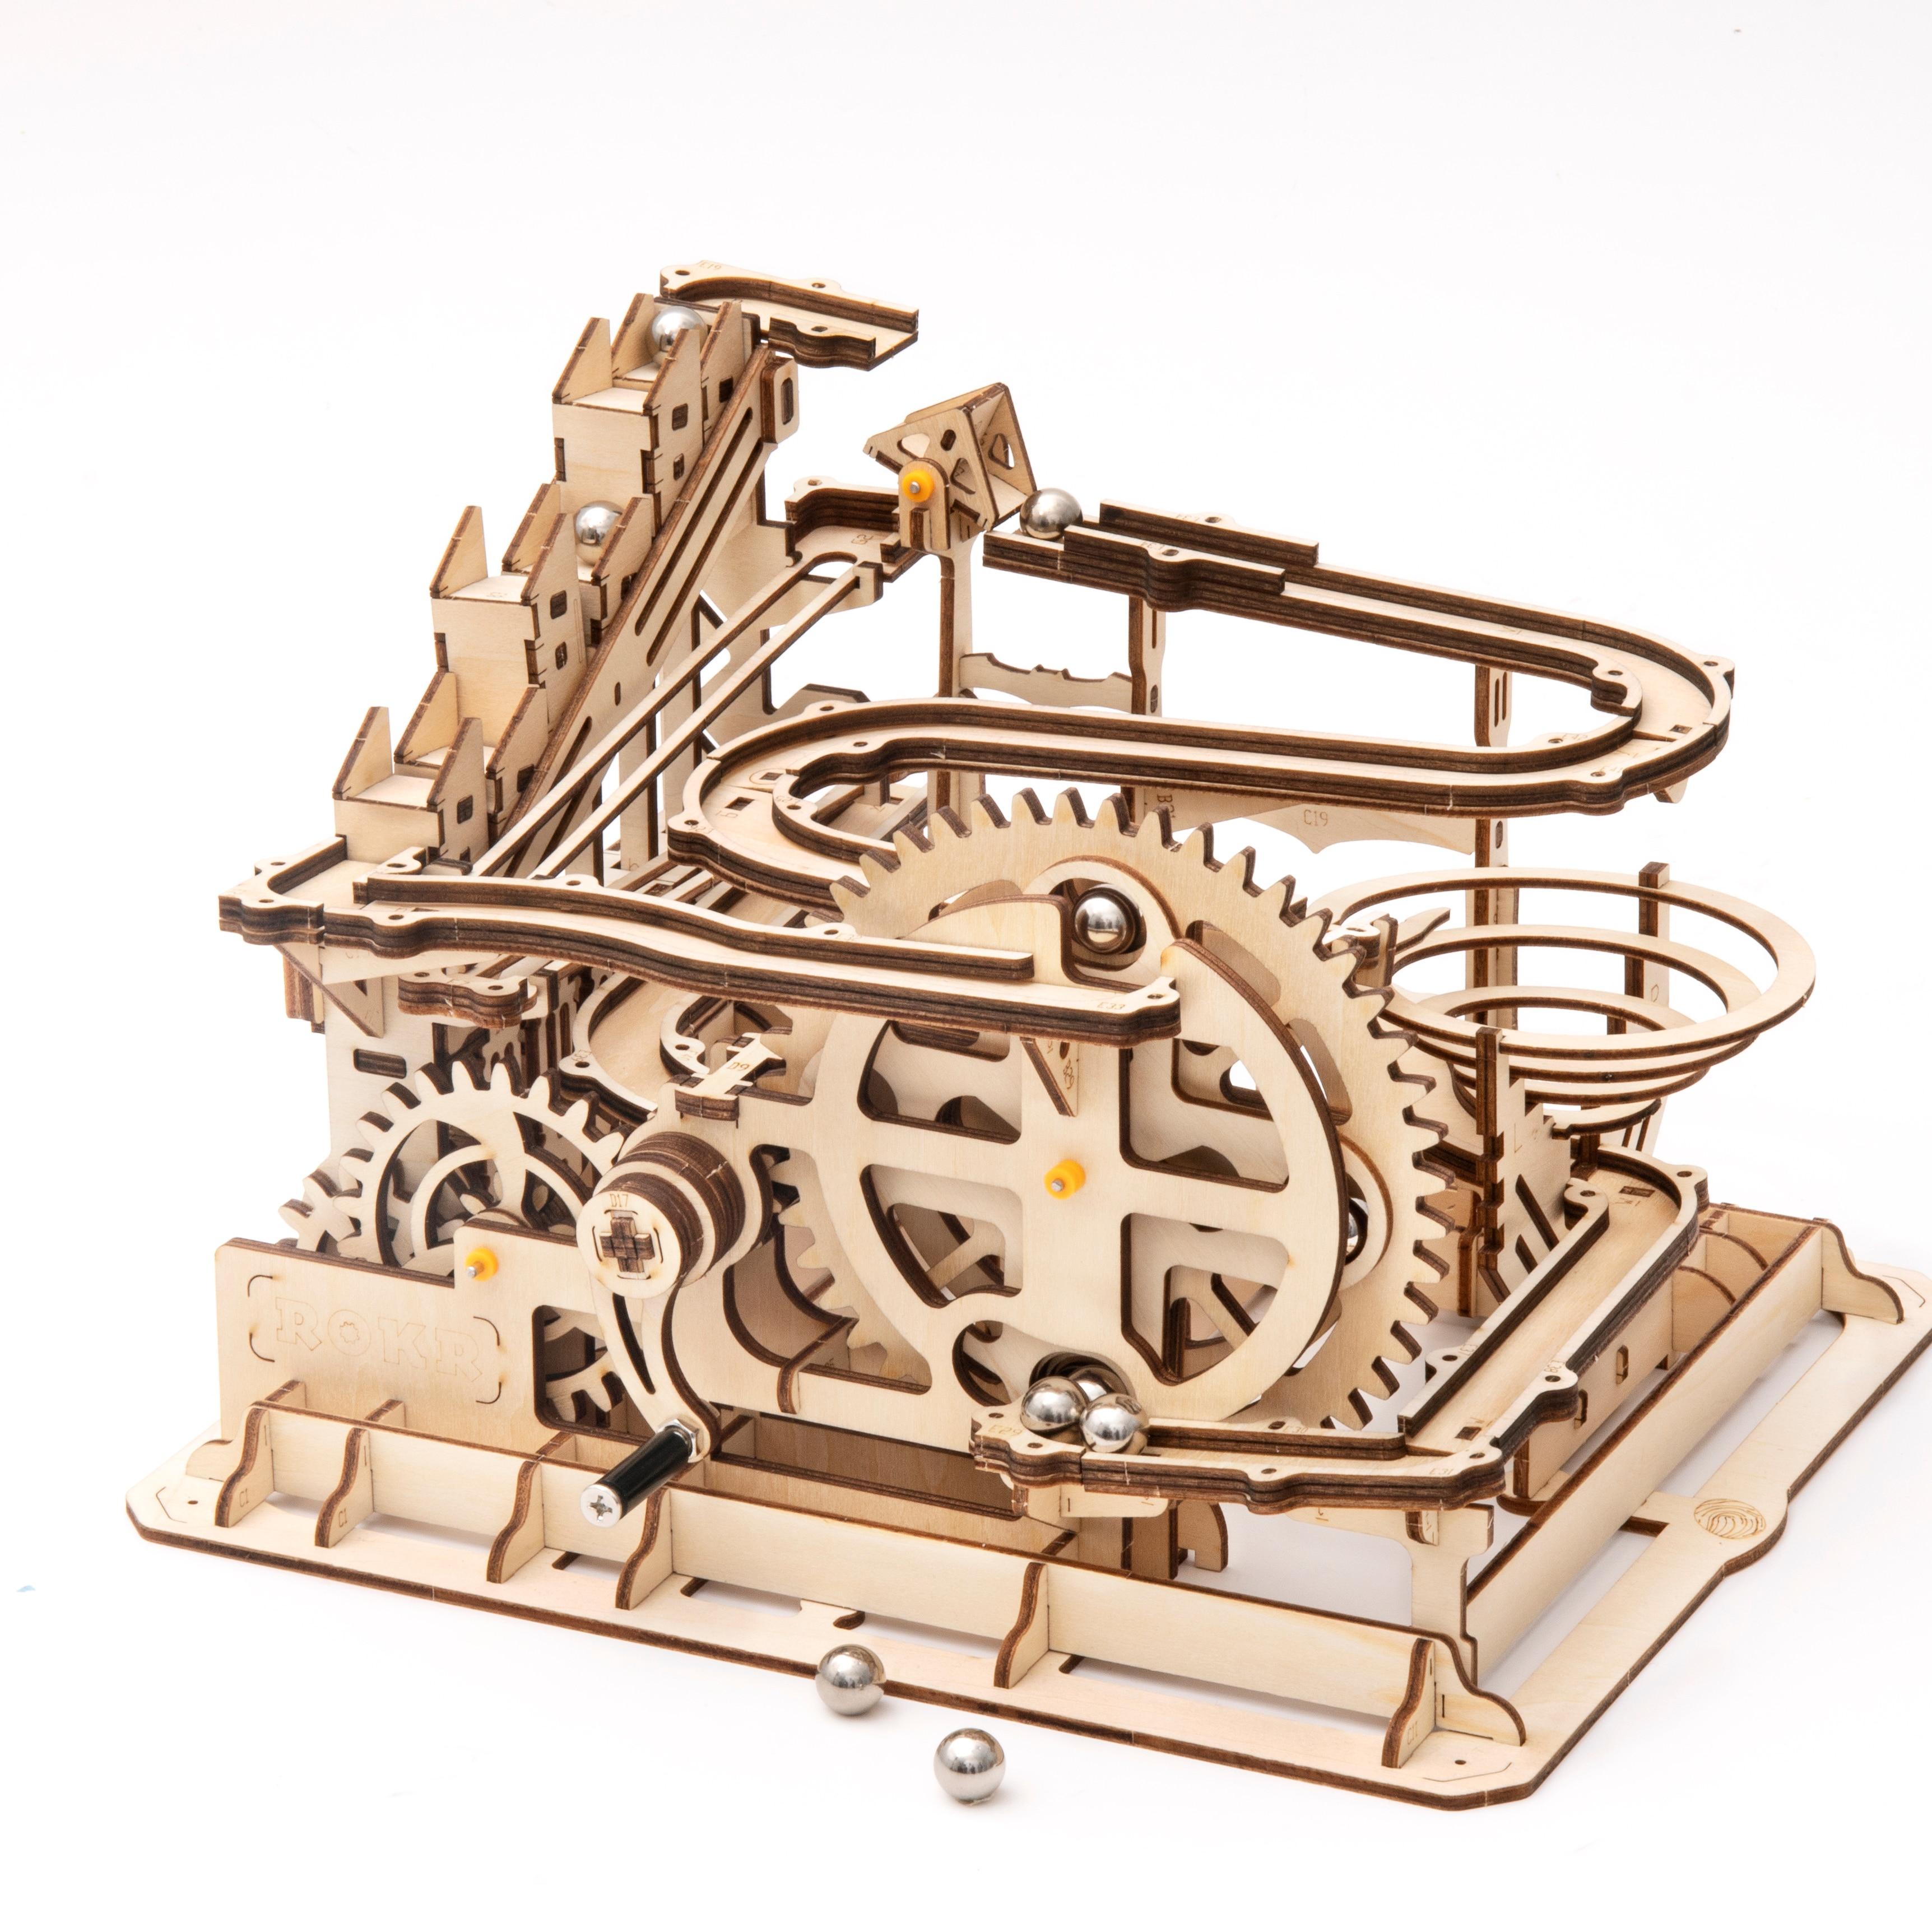 Robotime 4 أنواع DIY 3D الرخام تشغيل لعبة خشبية والعتاد محرك نموذج بناء أطقم لعبة للأطفال LG501-LG504 ل دروبشيبينغ